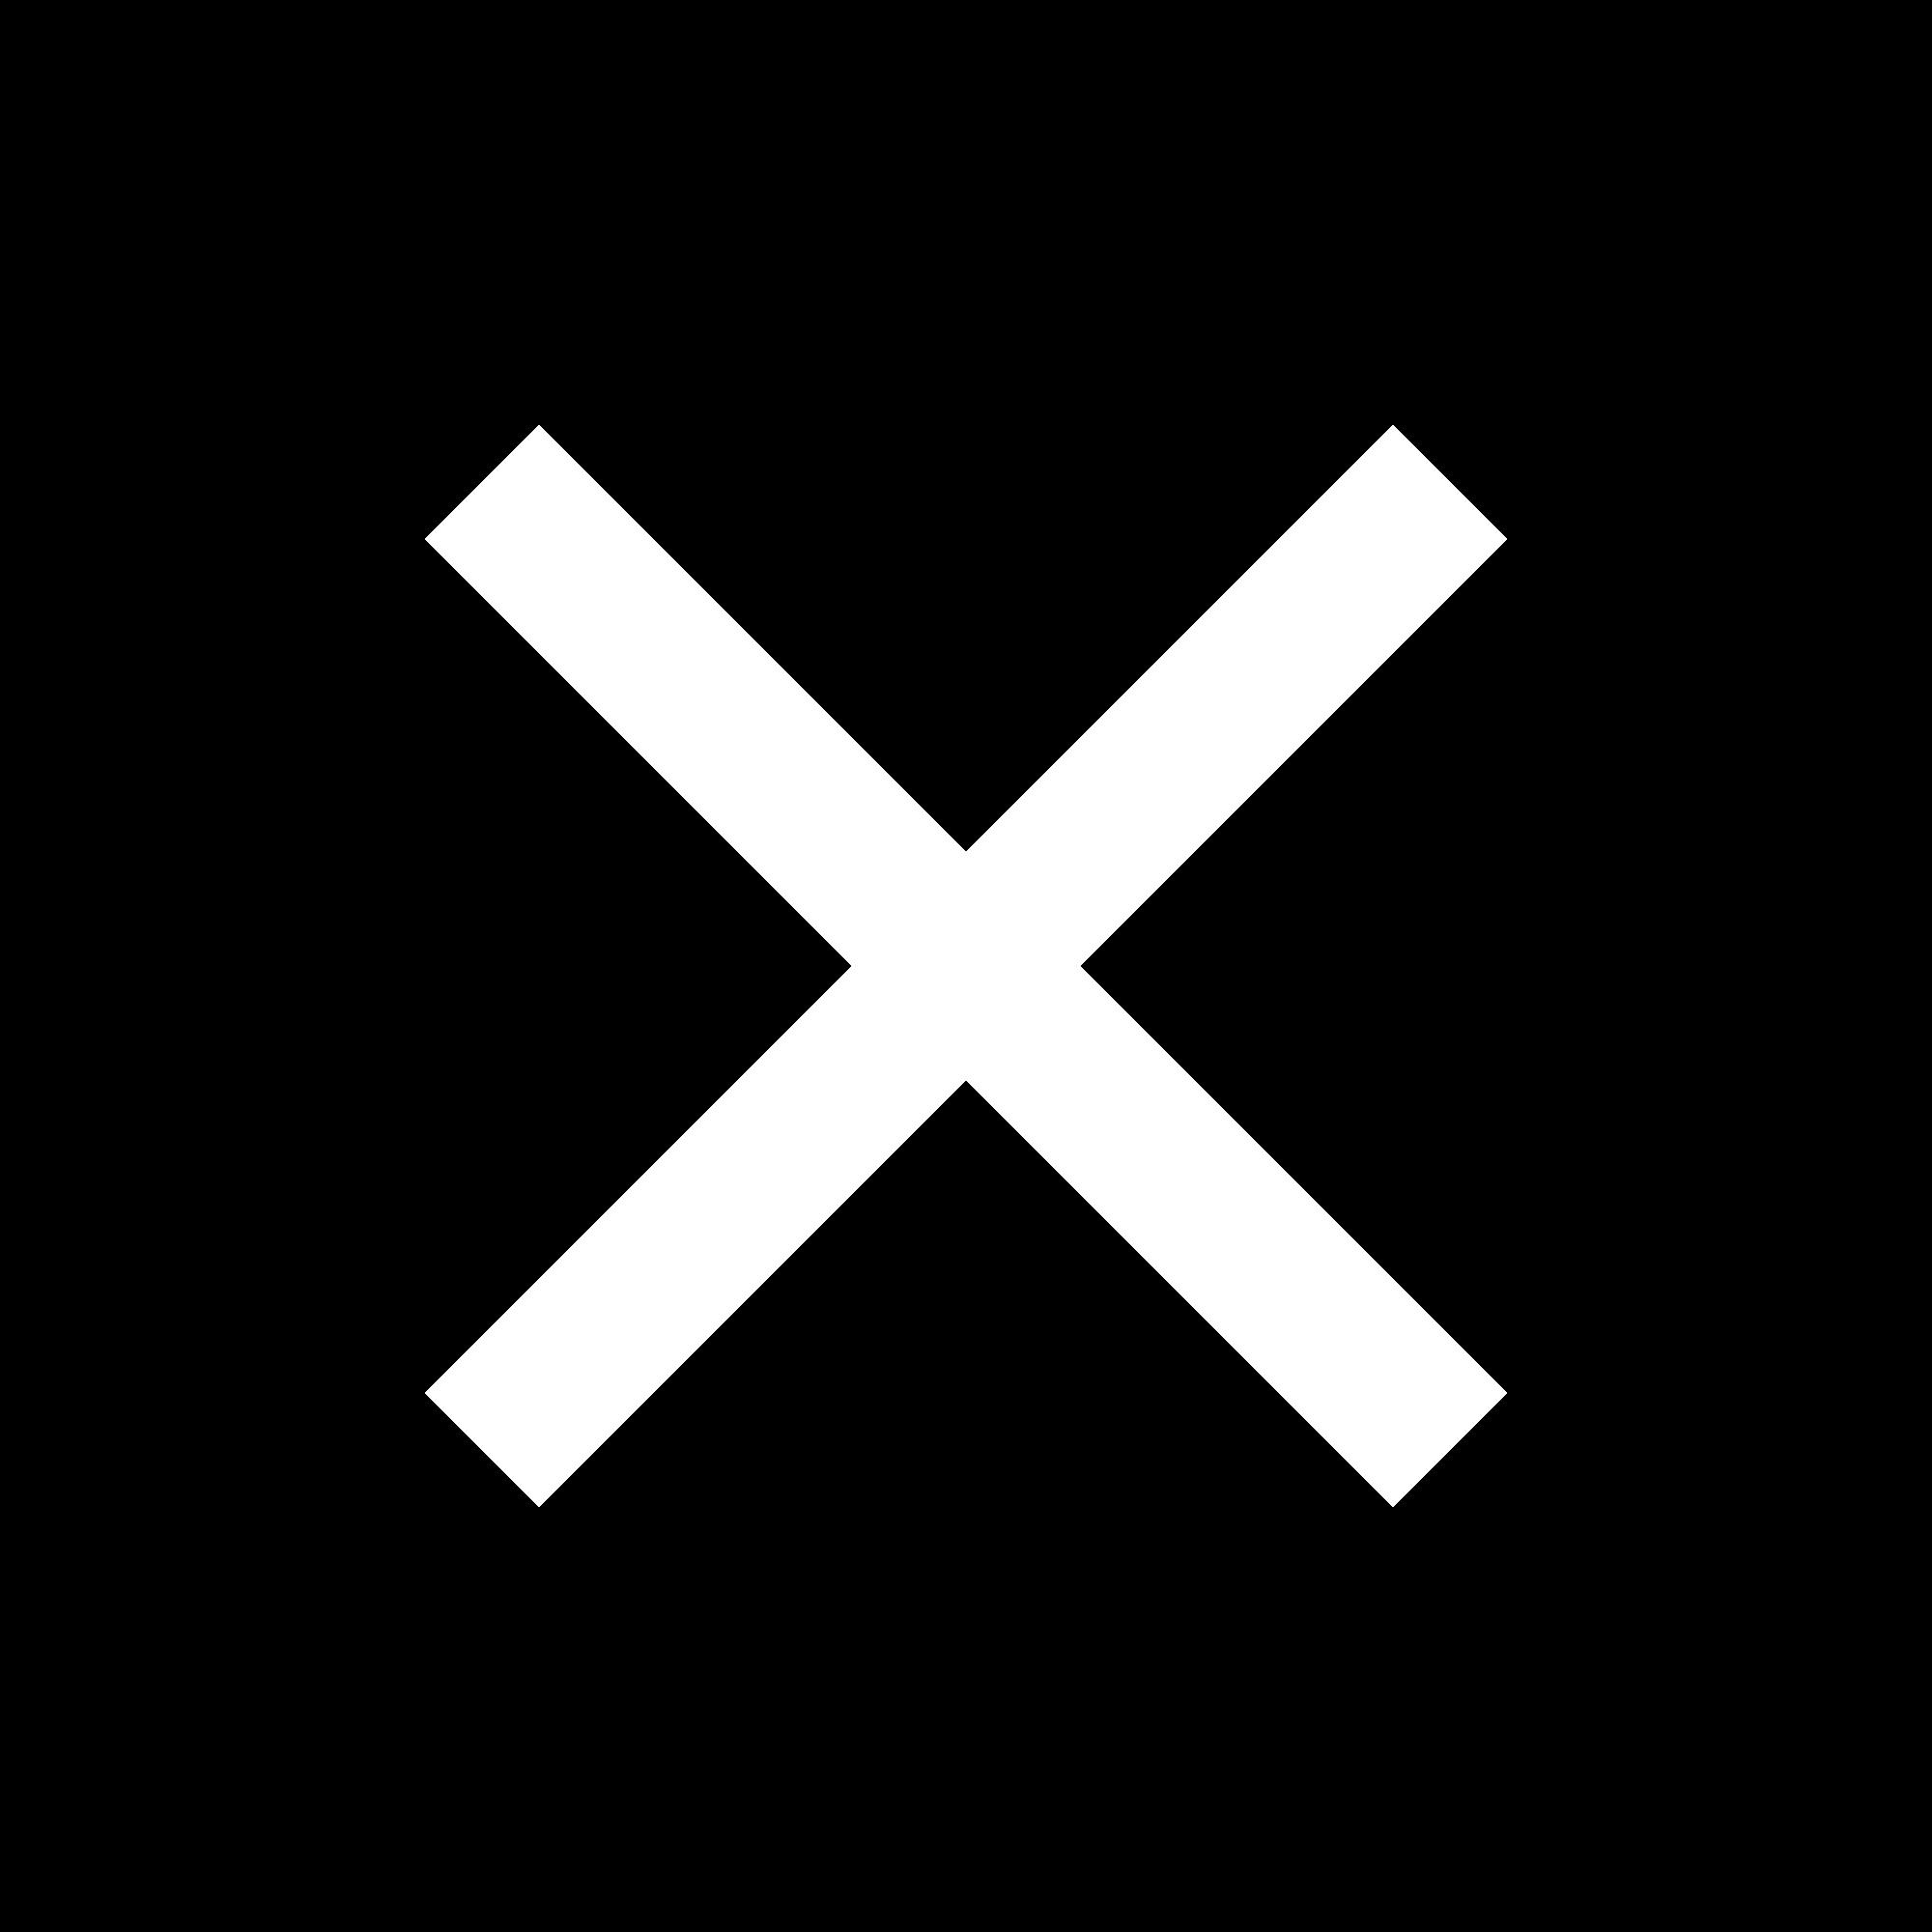 Image of X